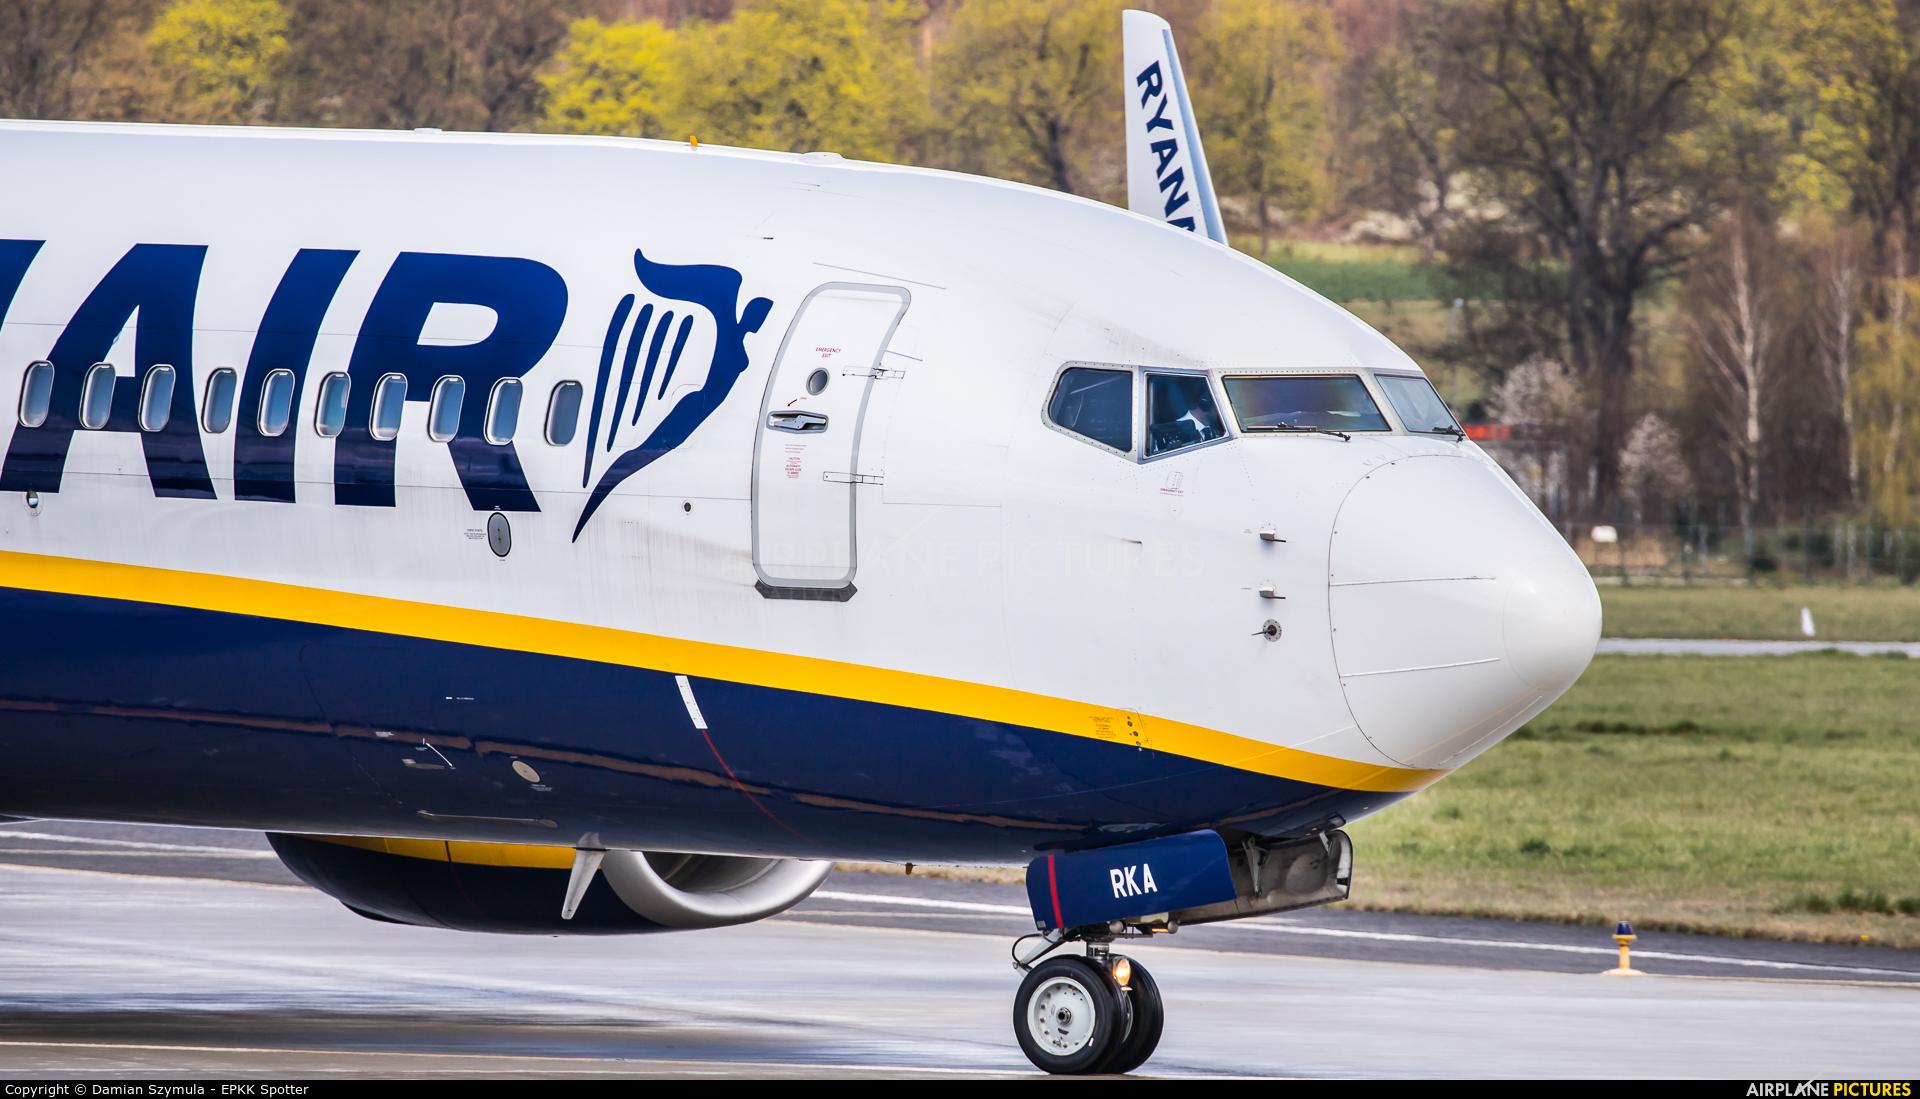 Ryanair Sun SP-RKA aircraft at Kraków - John Paul II Intl